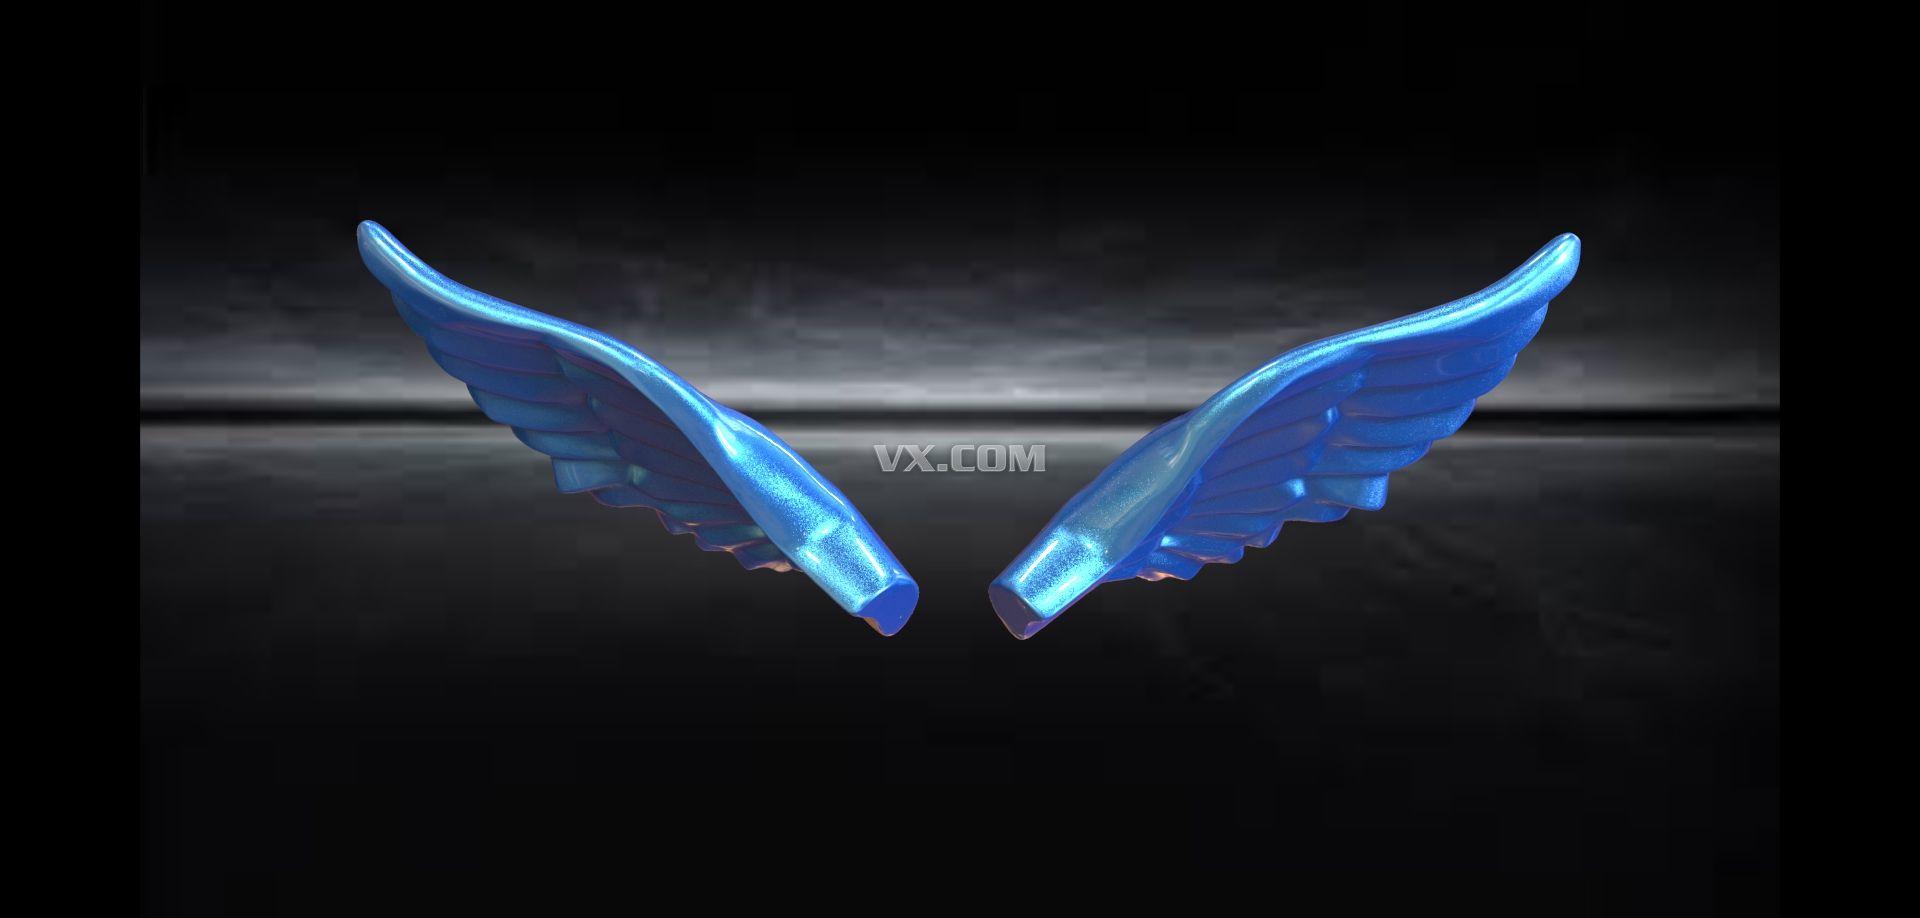 phtoshop翅膀形状素材